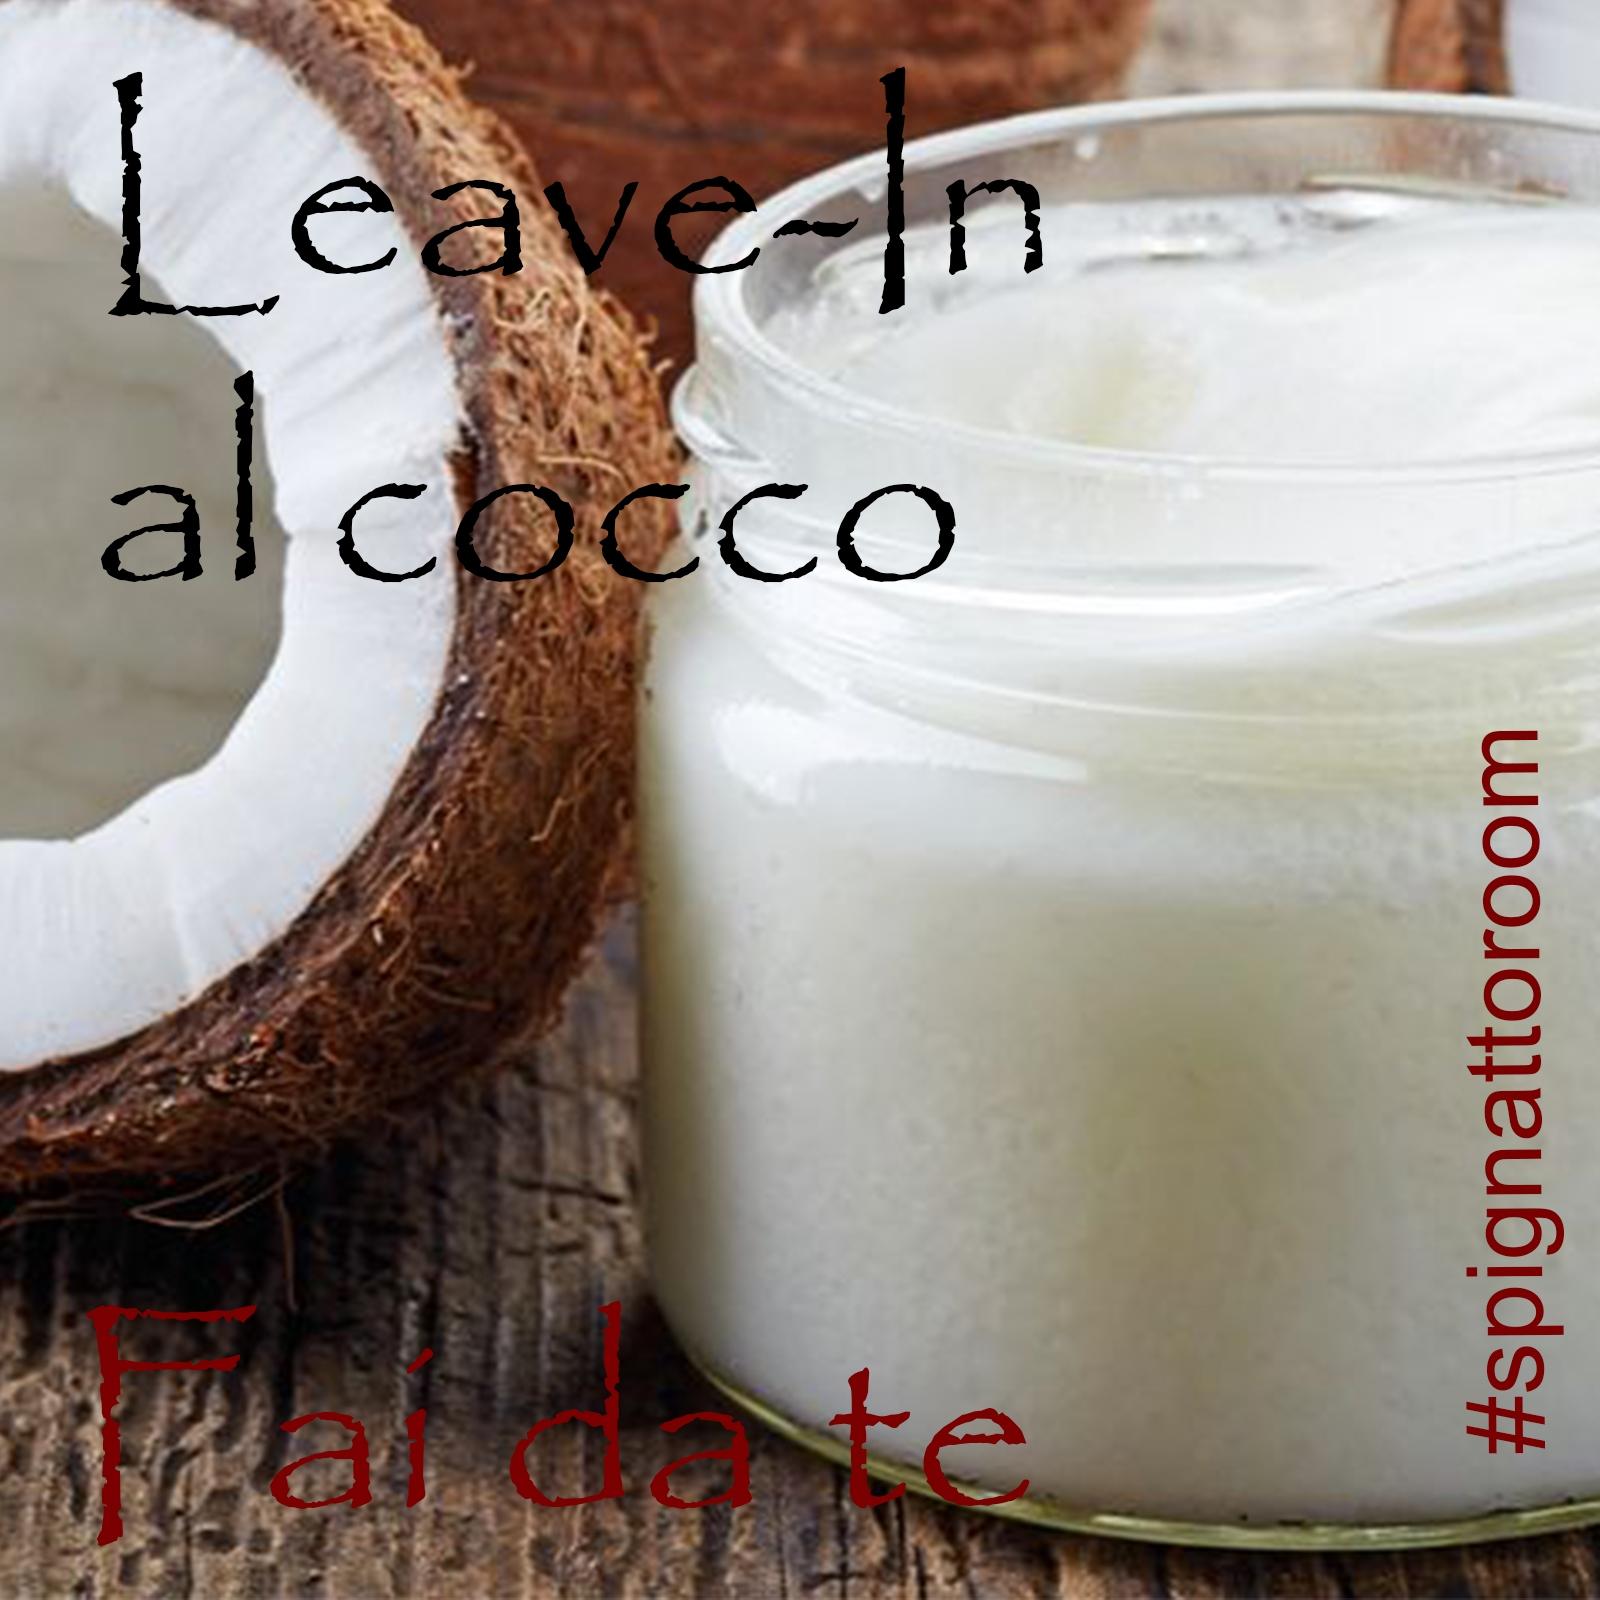 Leave-In al cocco